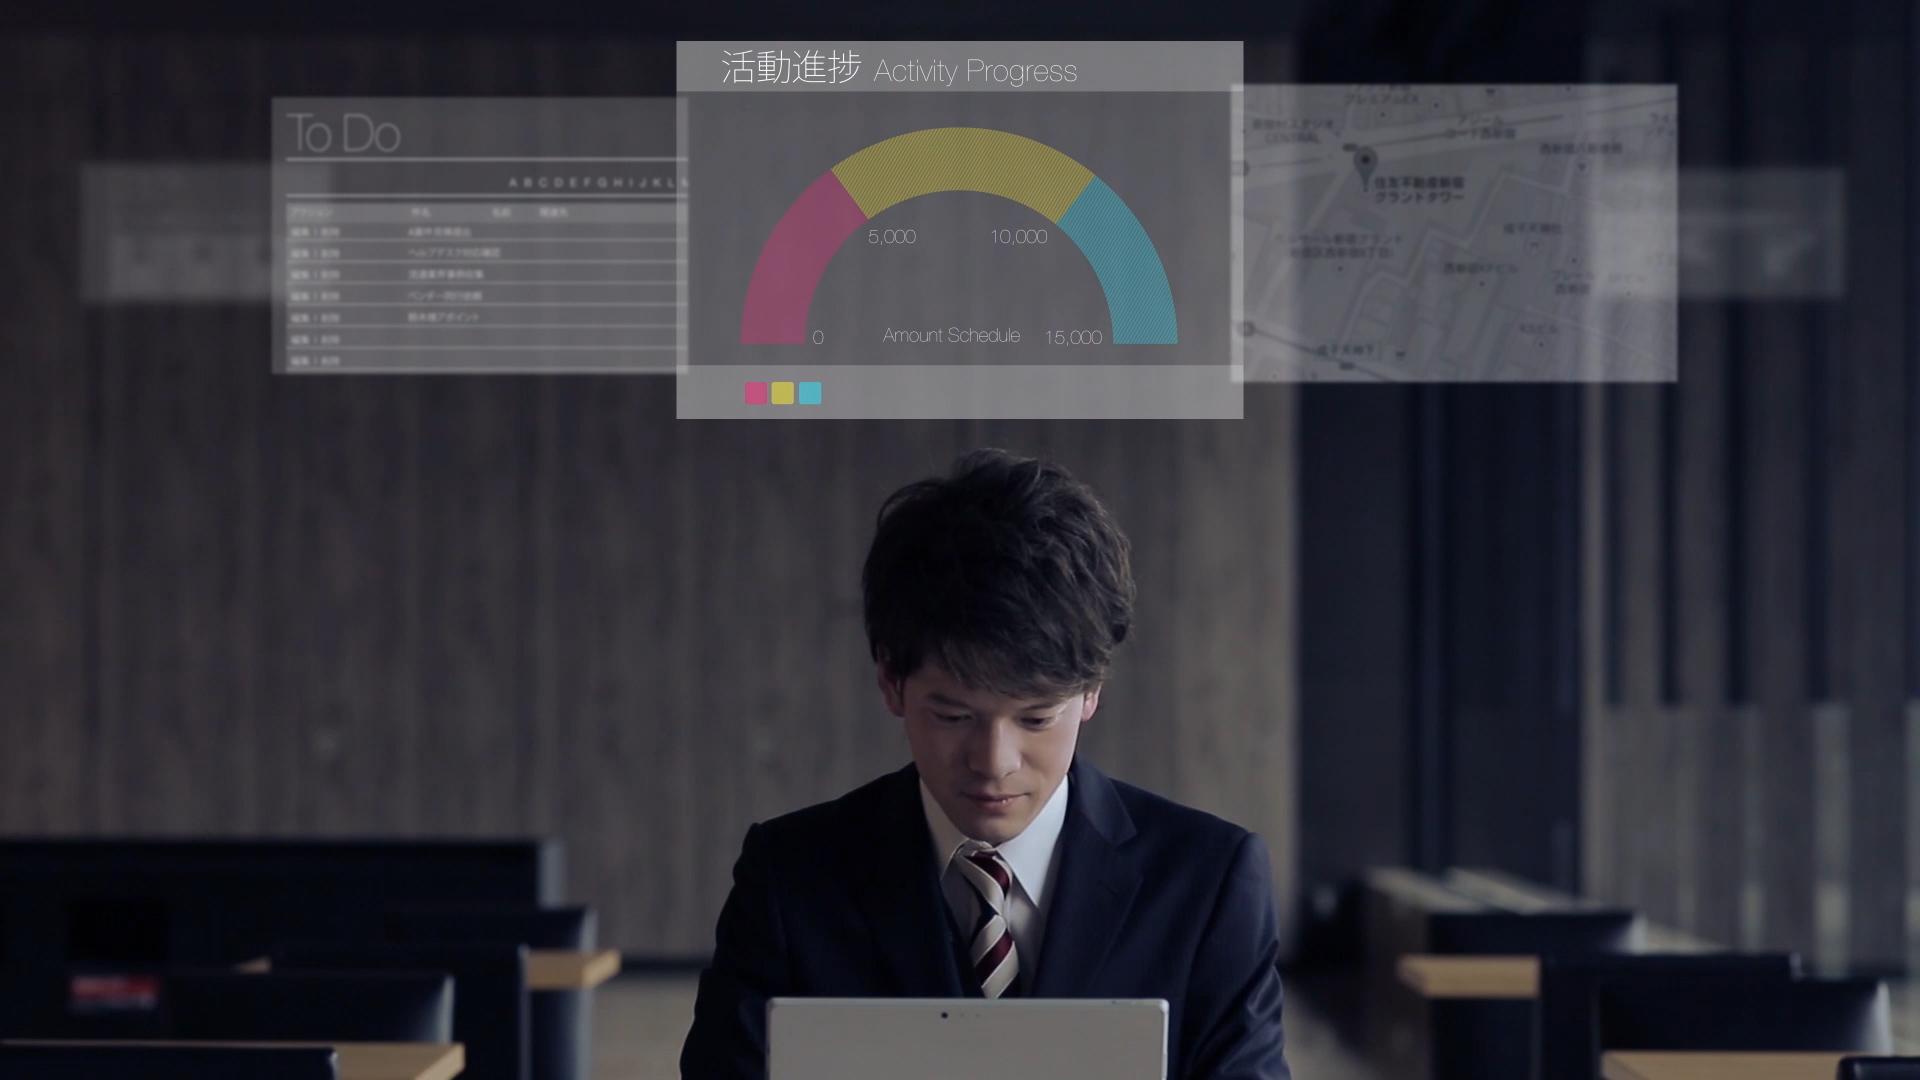 CONEXIO MOBILEWORK PROMOTIONMOVIE / コネクシオ モバイルワーク プロモーションムービー